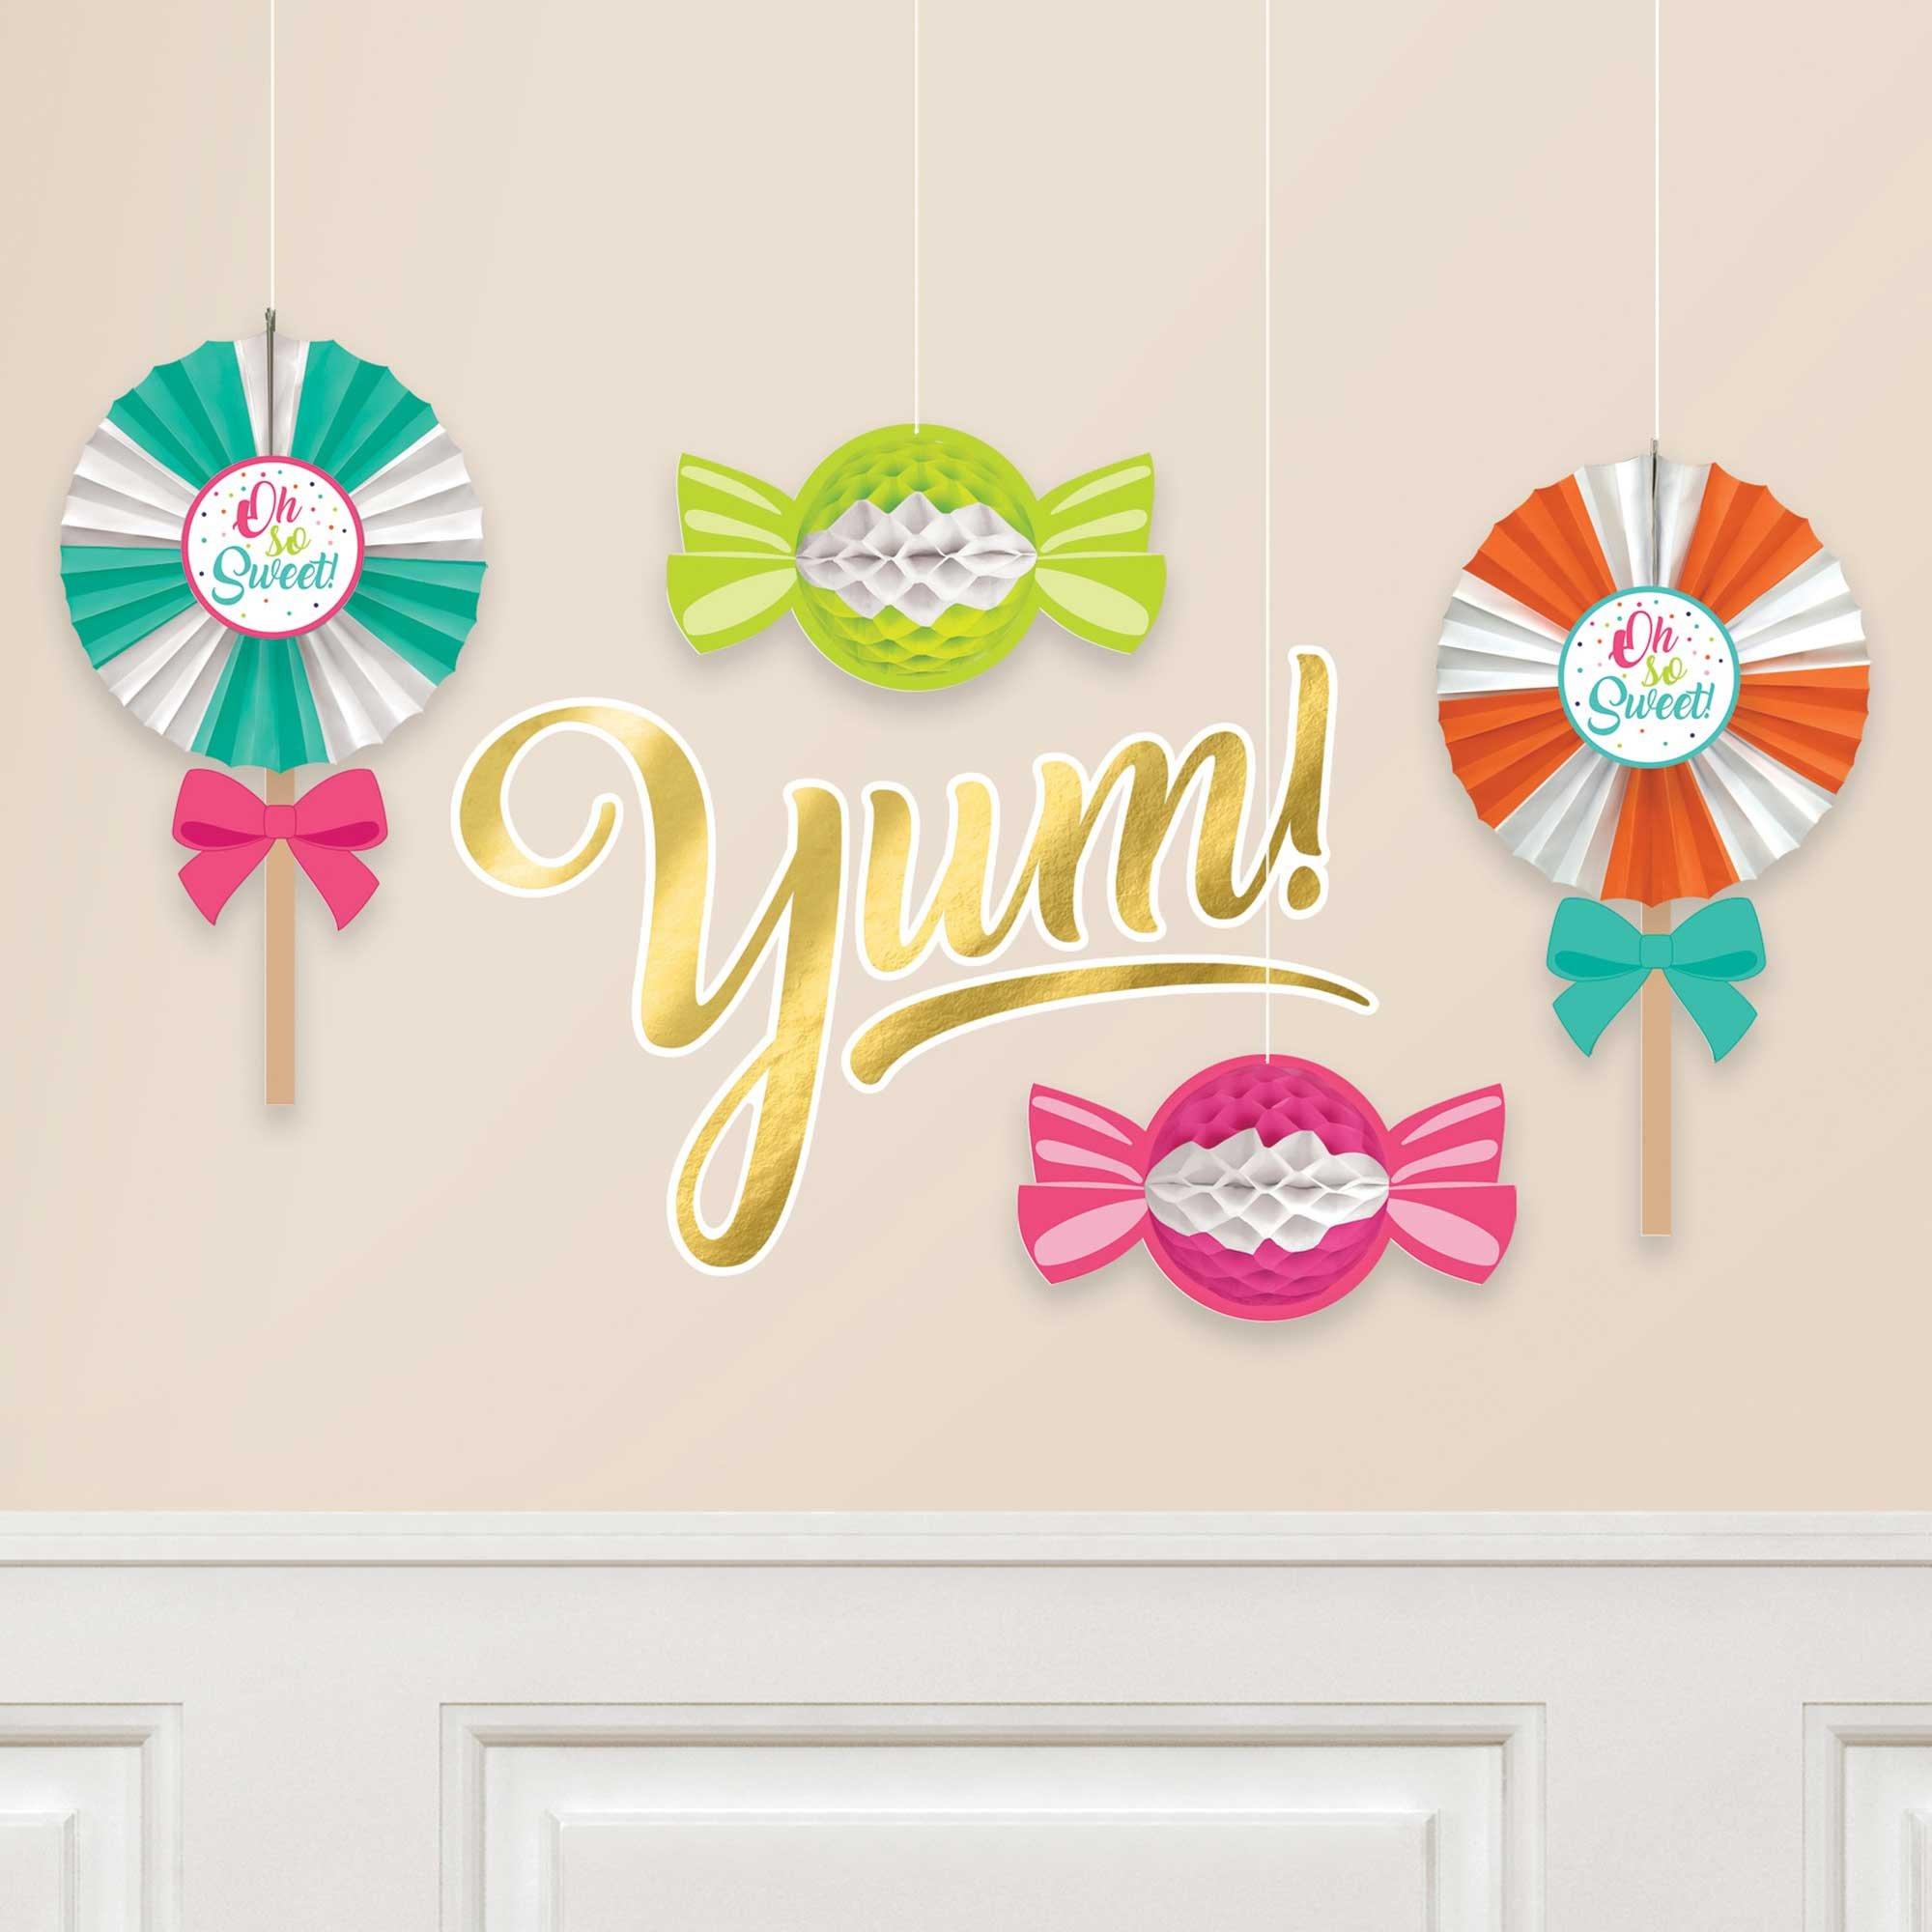 Sweets & Treats Honeycomb & Fans Decorating Kit